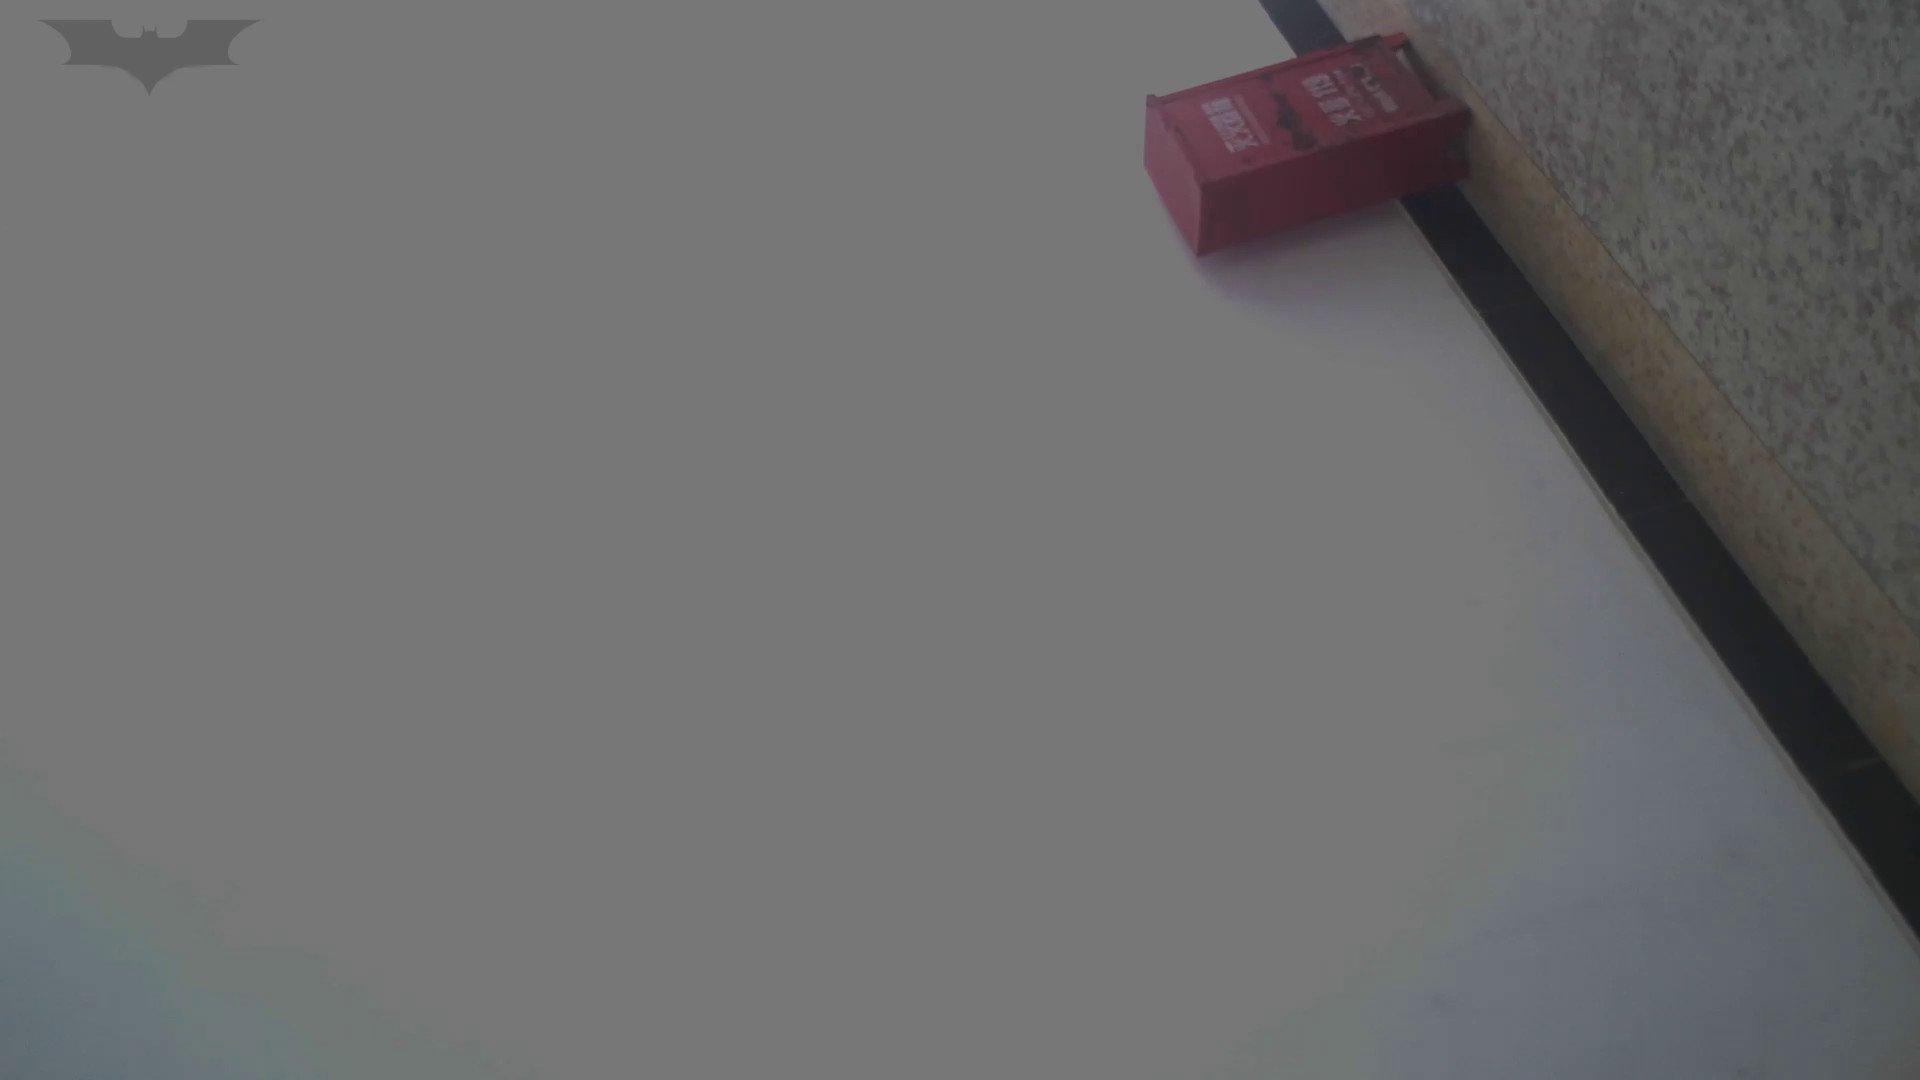 JD盗撮 美女の洗面所の秘密 Vol.09 美女 ワレメ無修正動画無料 95画像 61